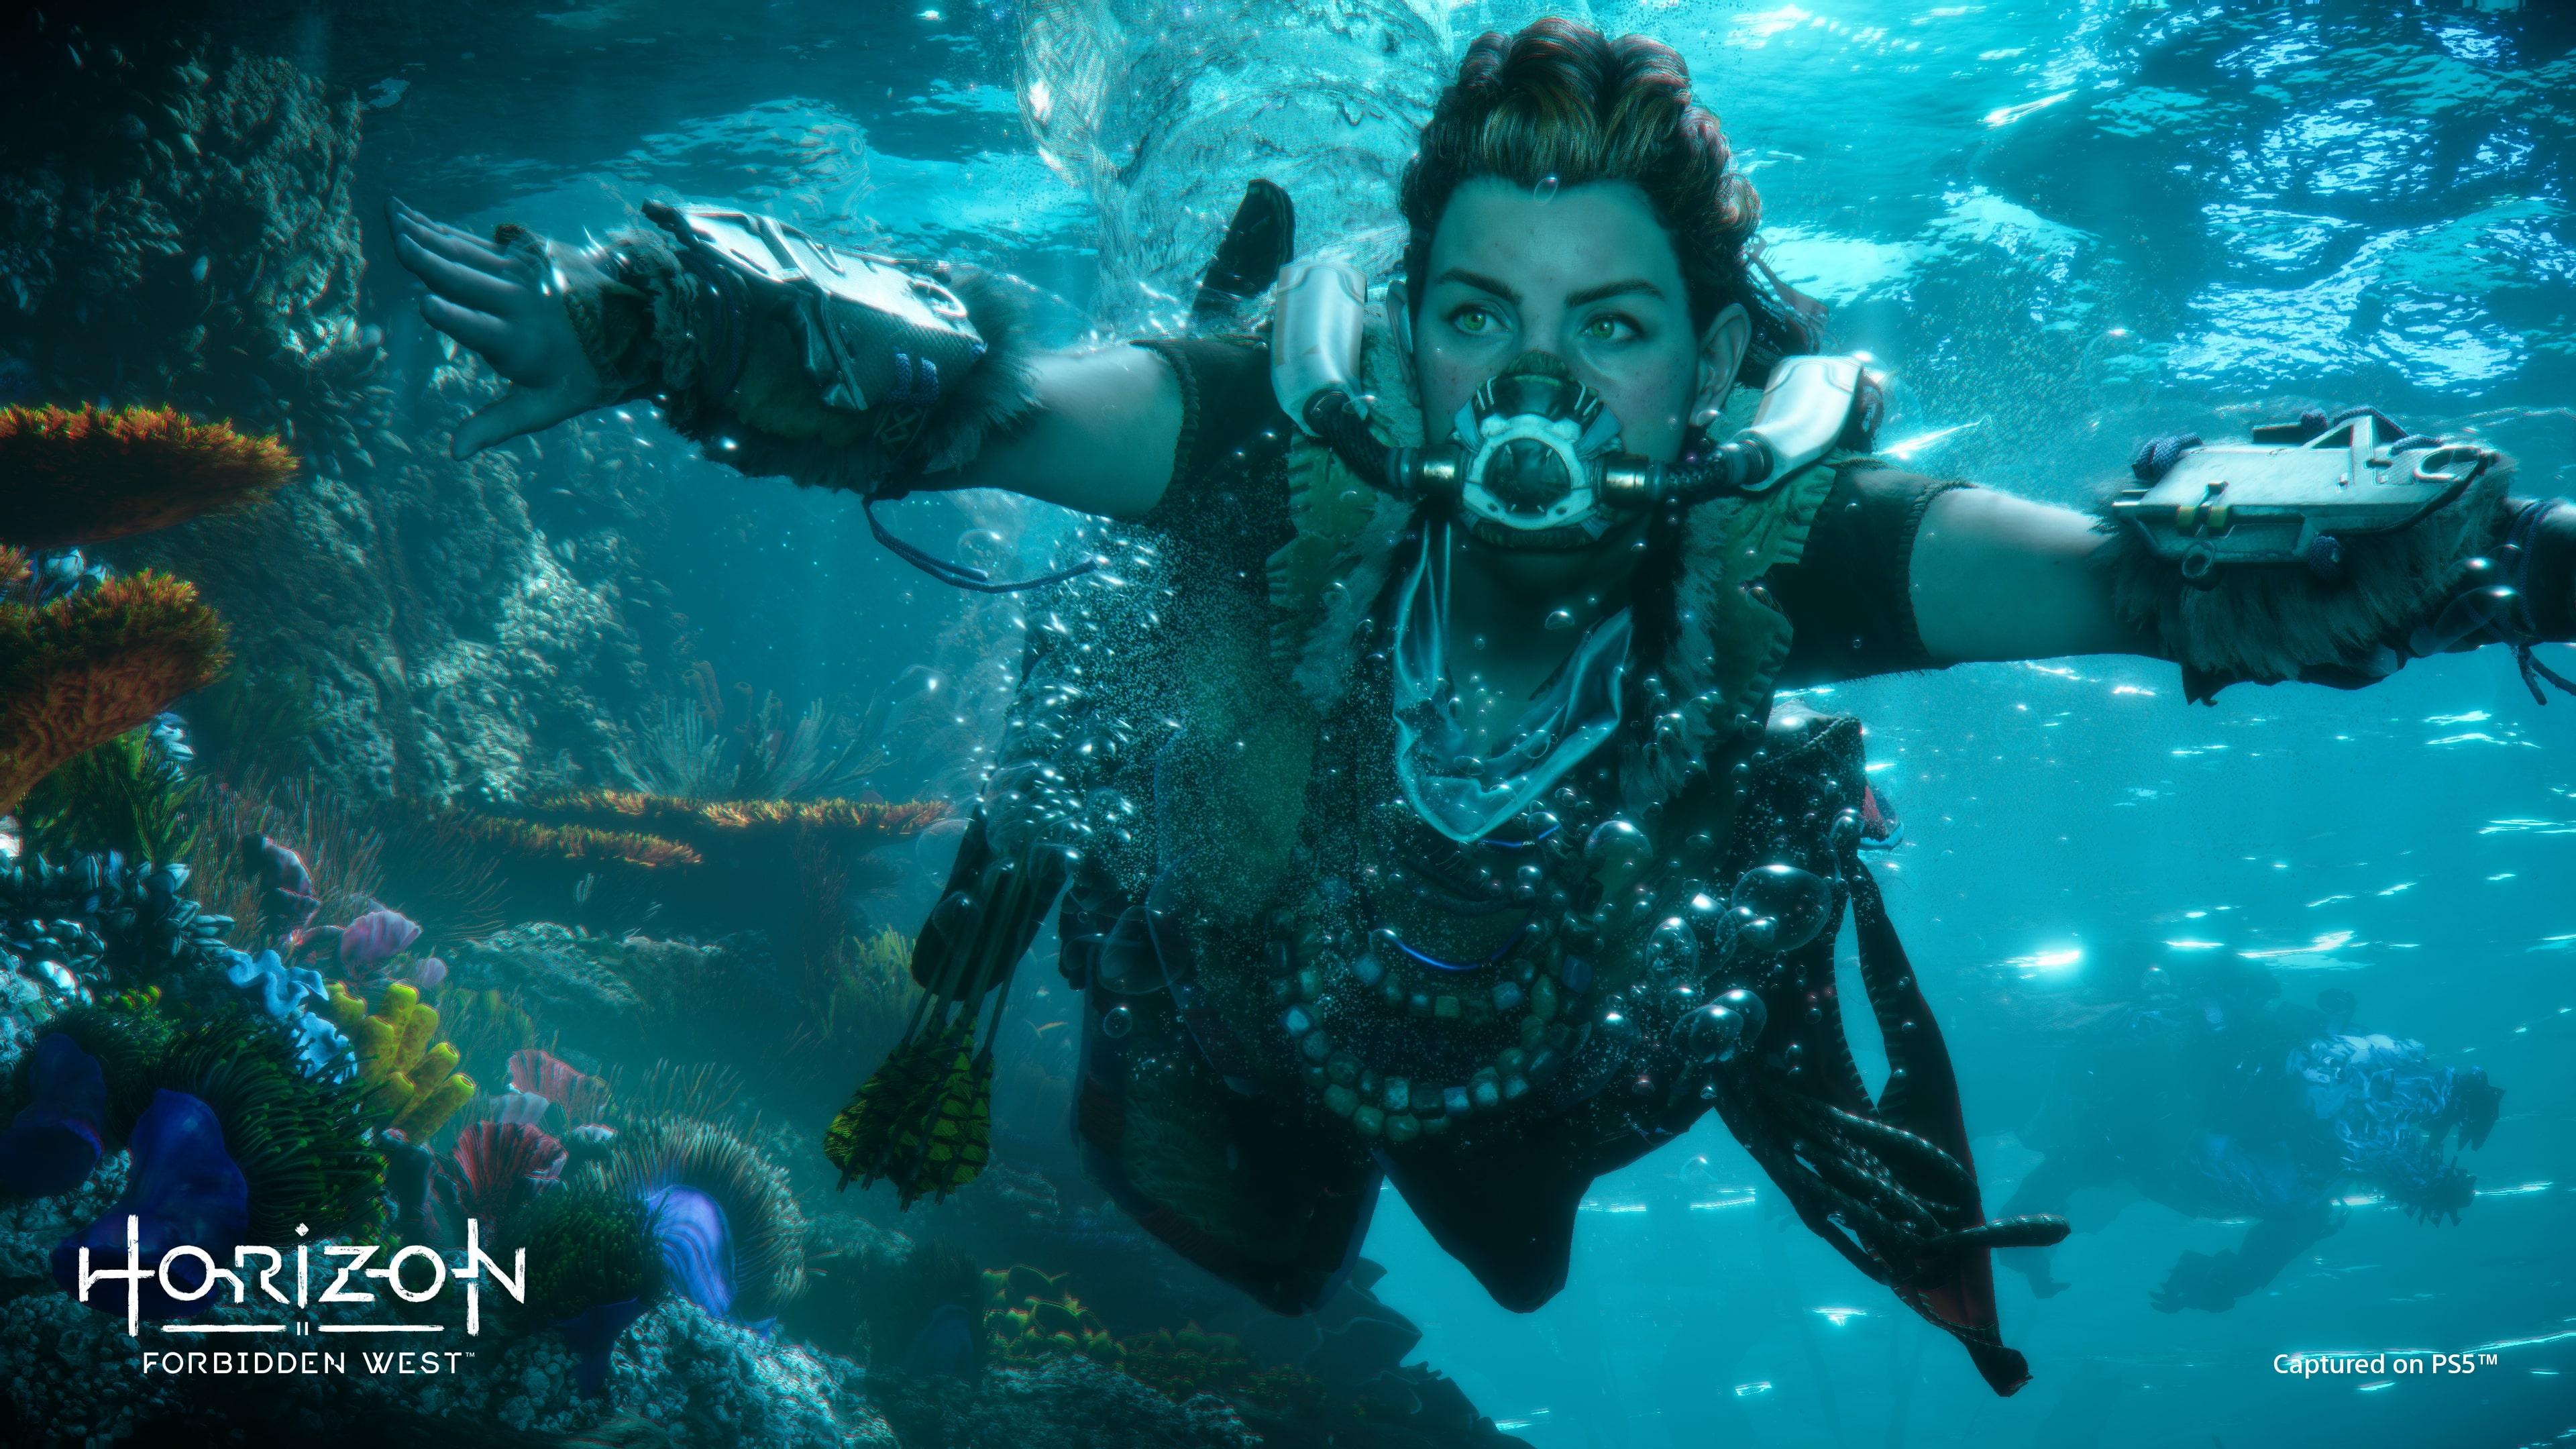 Aloy from Horizon Forbidden West swims underwater